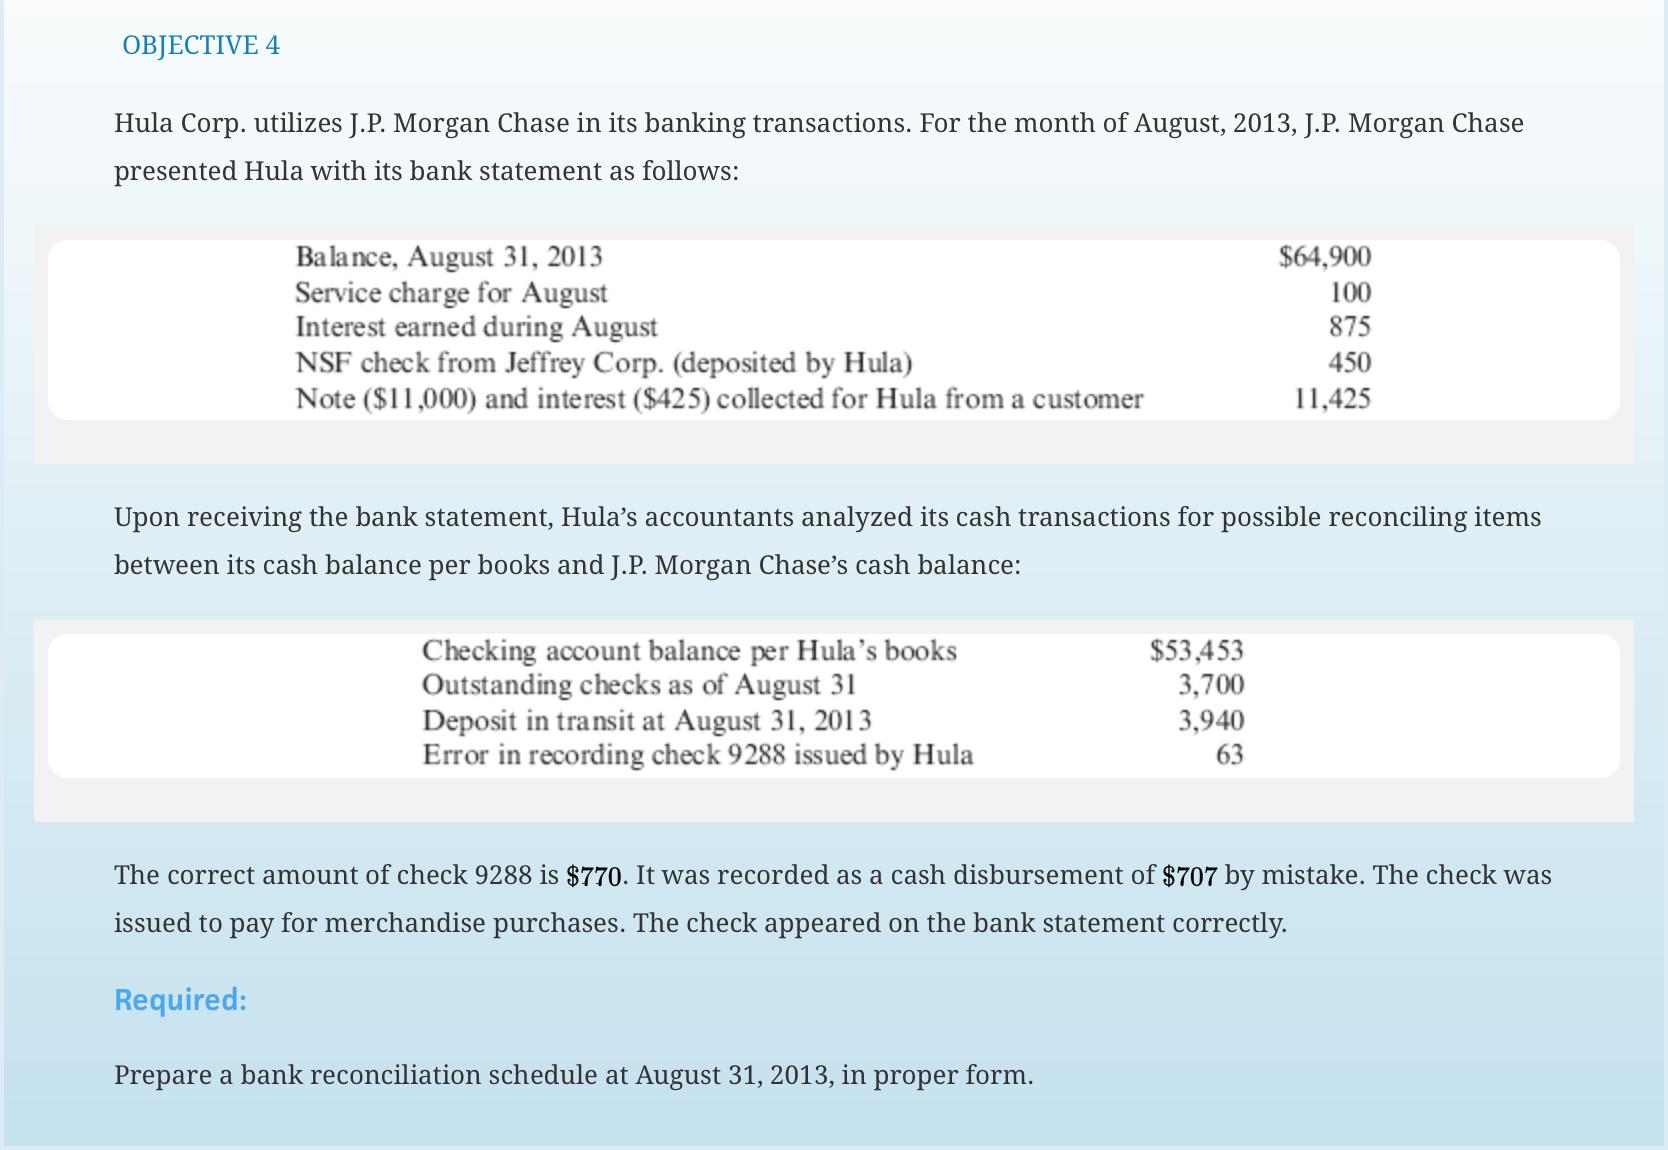 Hula Corp. Utilizes J.P. Morgan Chase In Its Banki